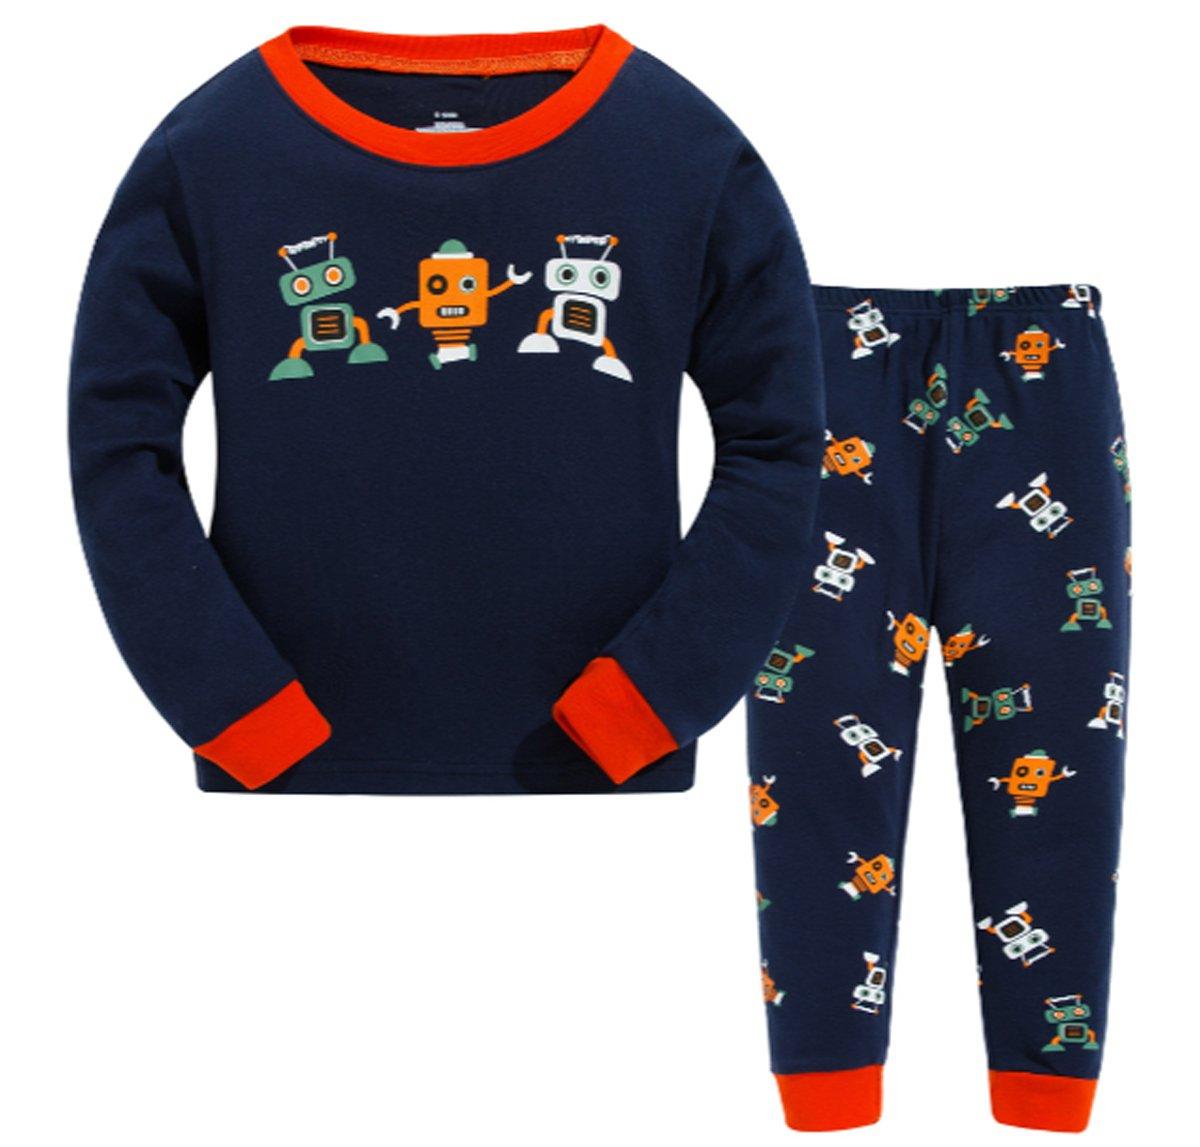 LOVE ROSE Robot Little Boys Girls' Pajamas Sets 100% Cotton Clothes Toddler Kid Sleepwear by LOVE ROSE (Image #1)